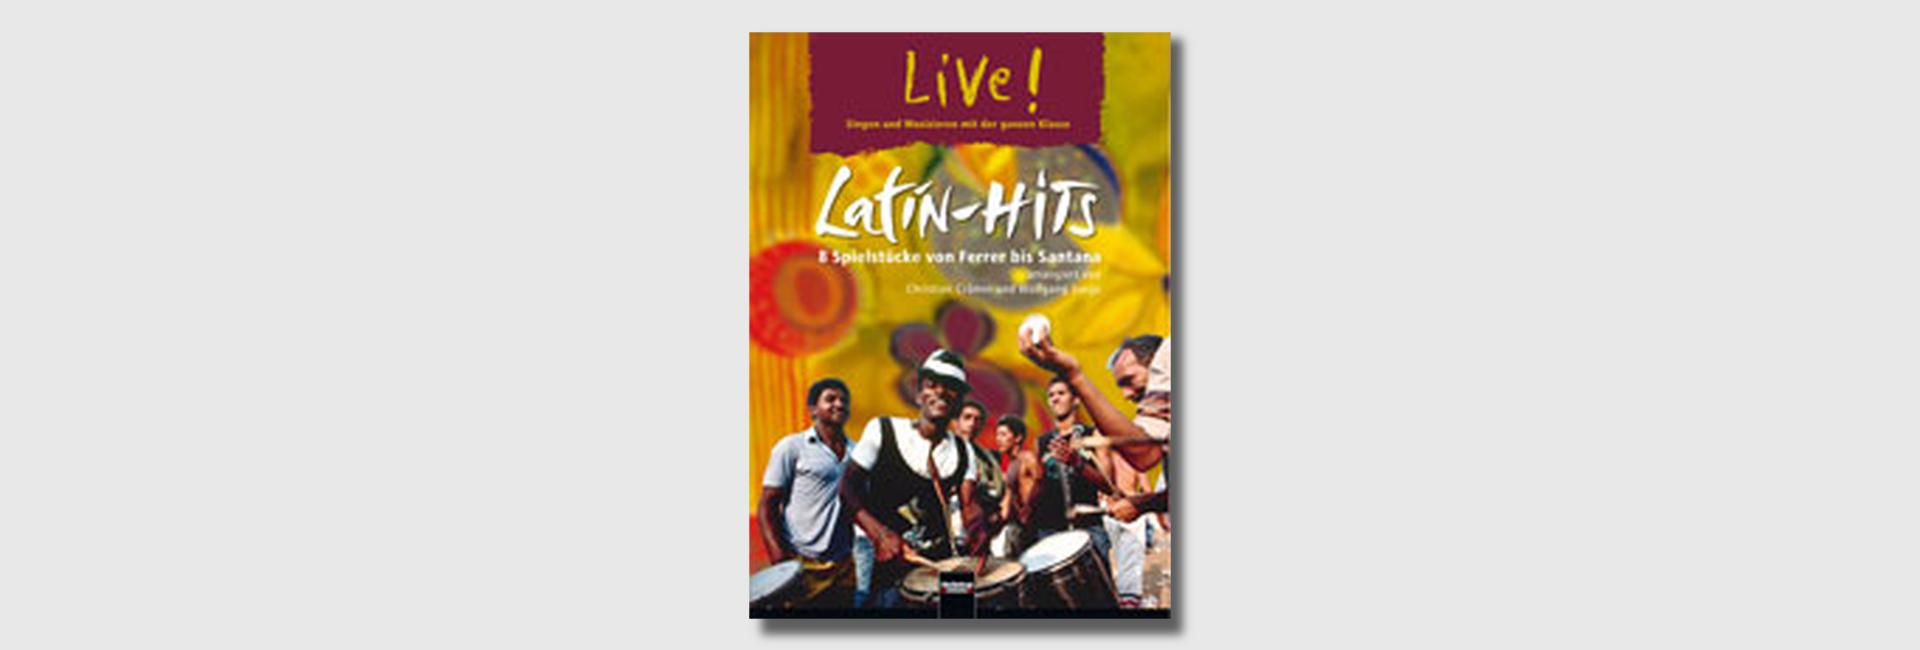 Live! Latin Hits